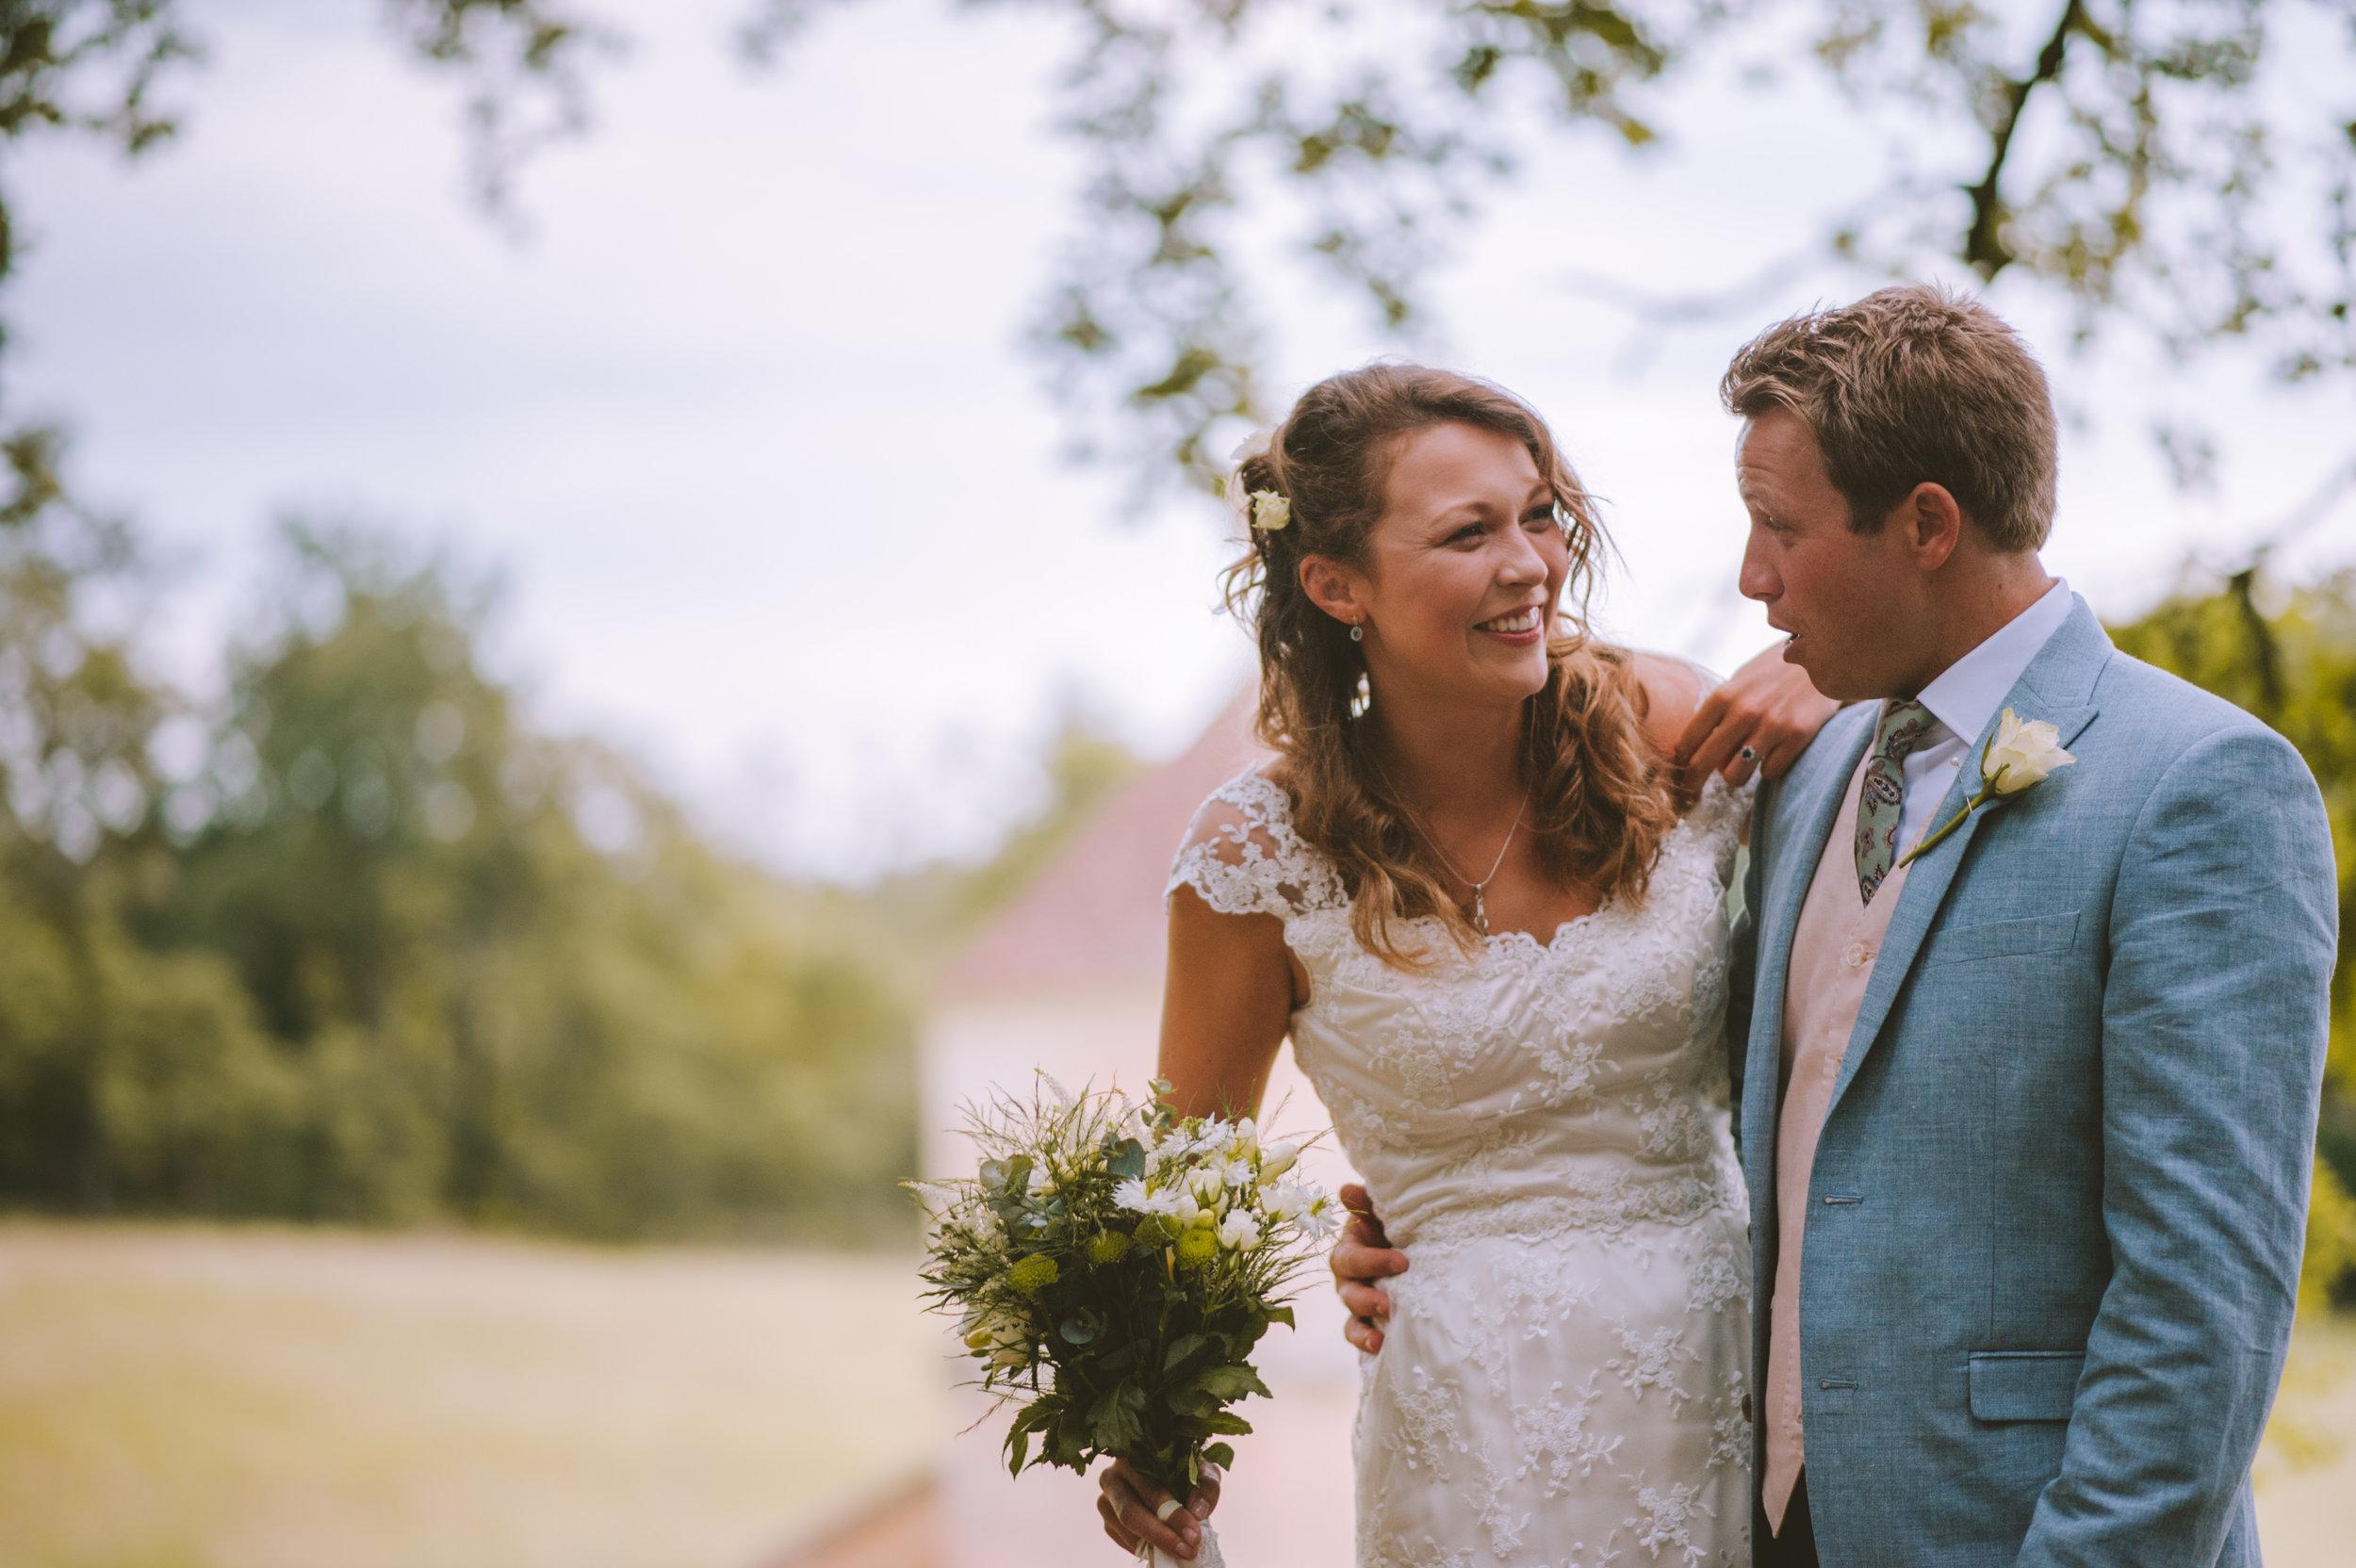 dordogne-wedding-photographer-mark-shaw-19.jpg